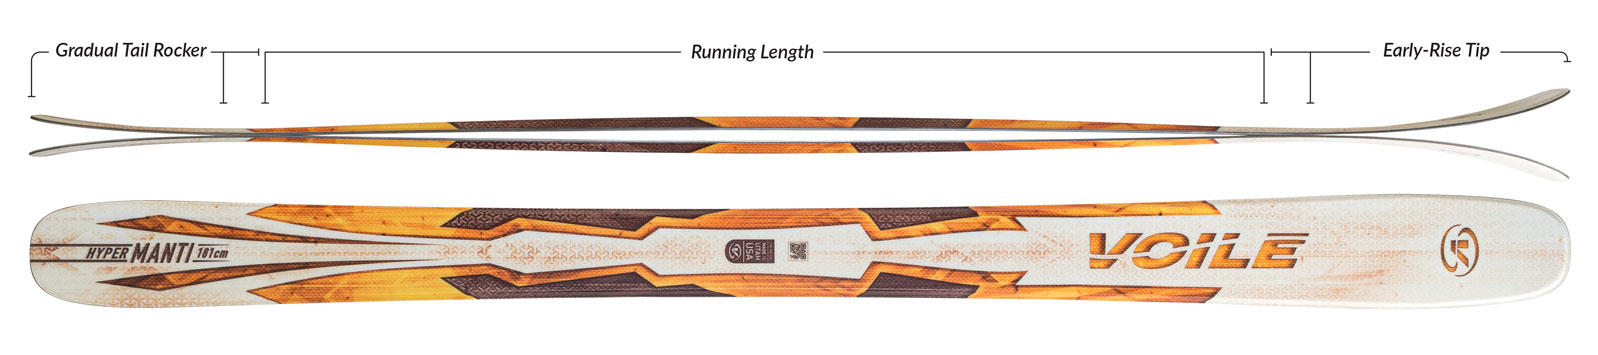 Voile Hyper Manti Skis Camber Profile